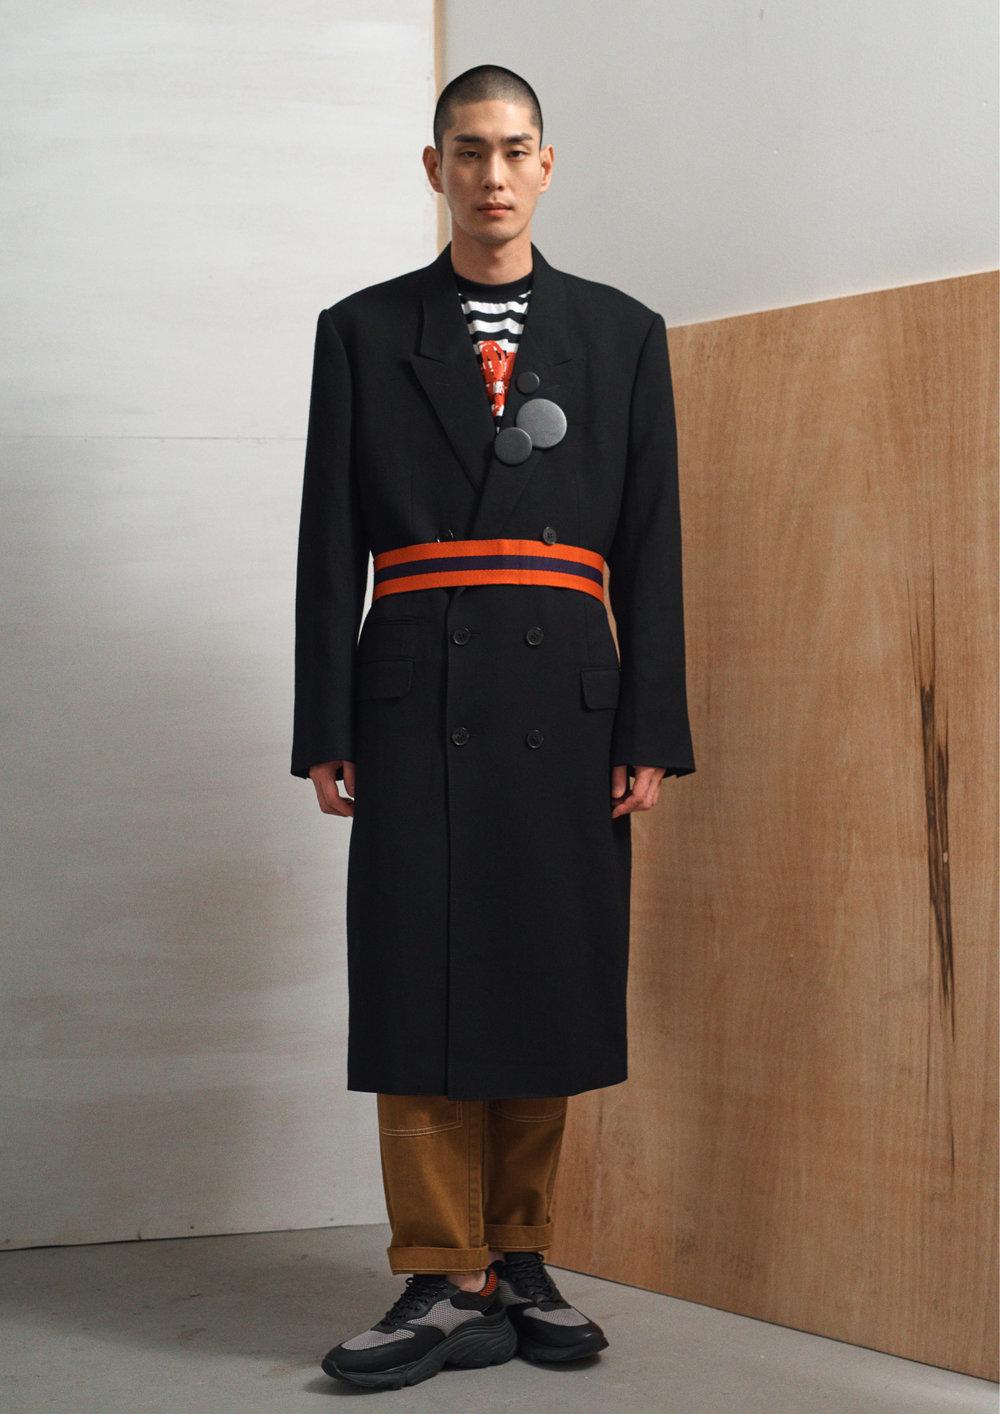 Coat - John Lawrence Sullivan T-Shirt - Stussy Trousers- Pronounce Shoes - Pregis Belt - Stylists Own